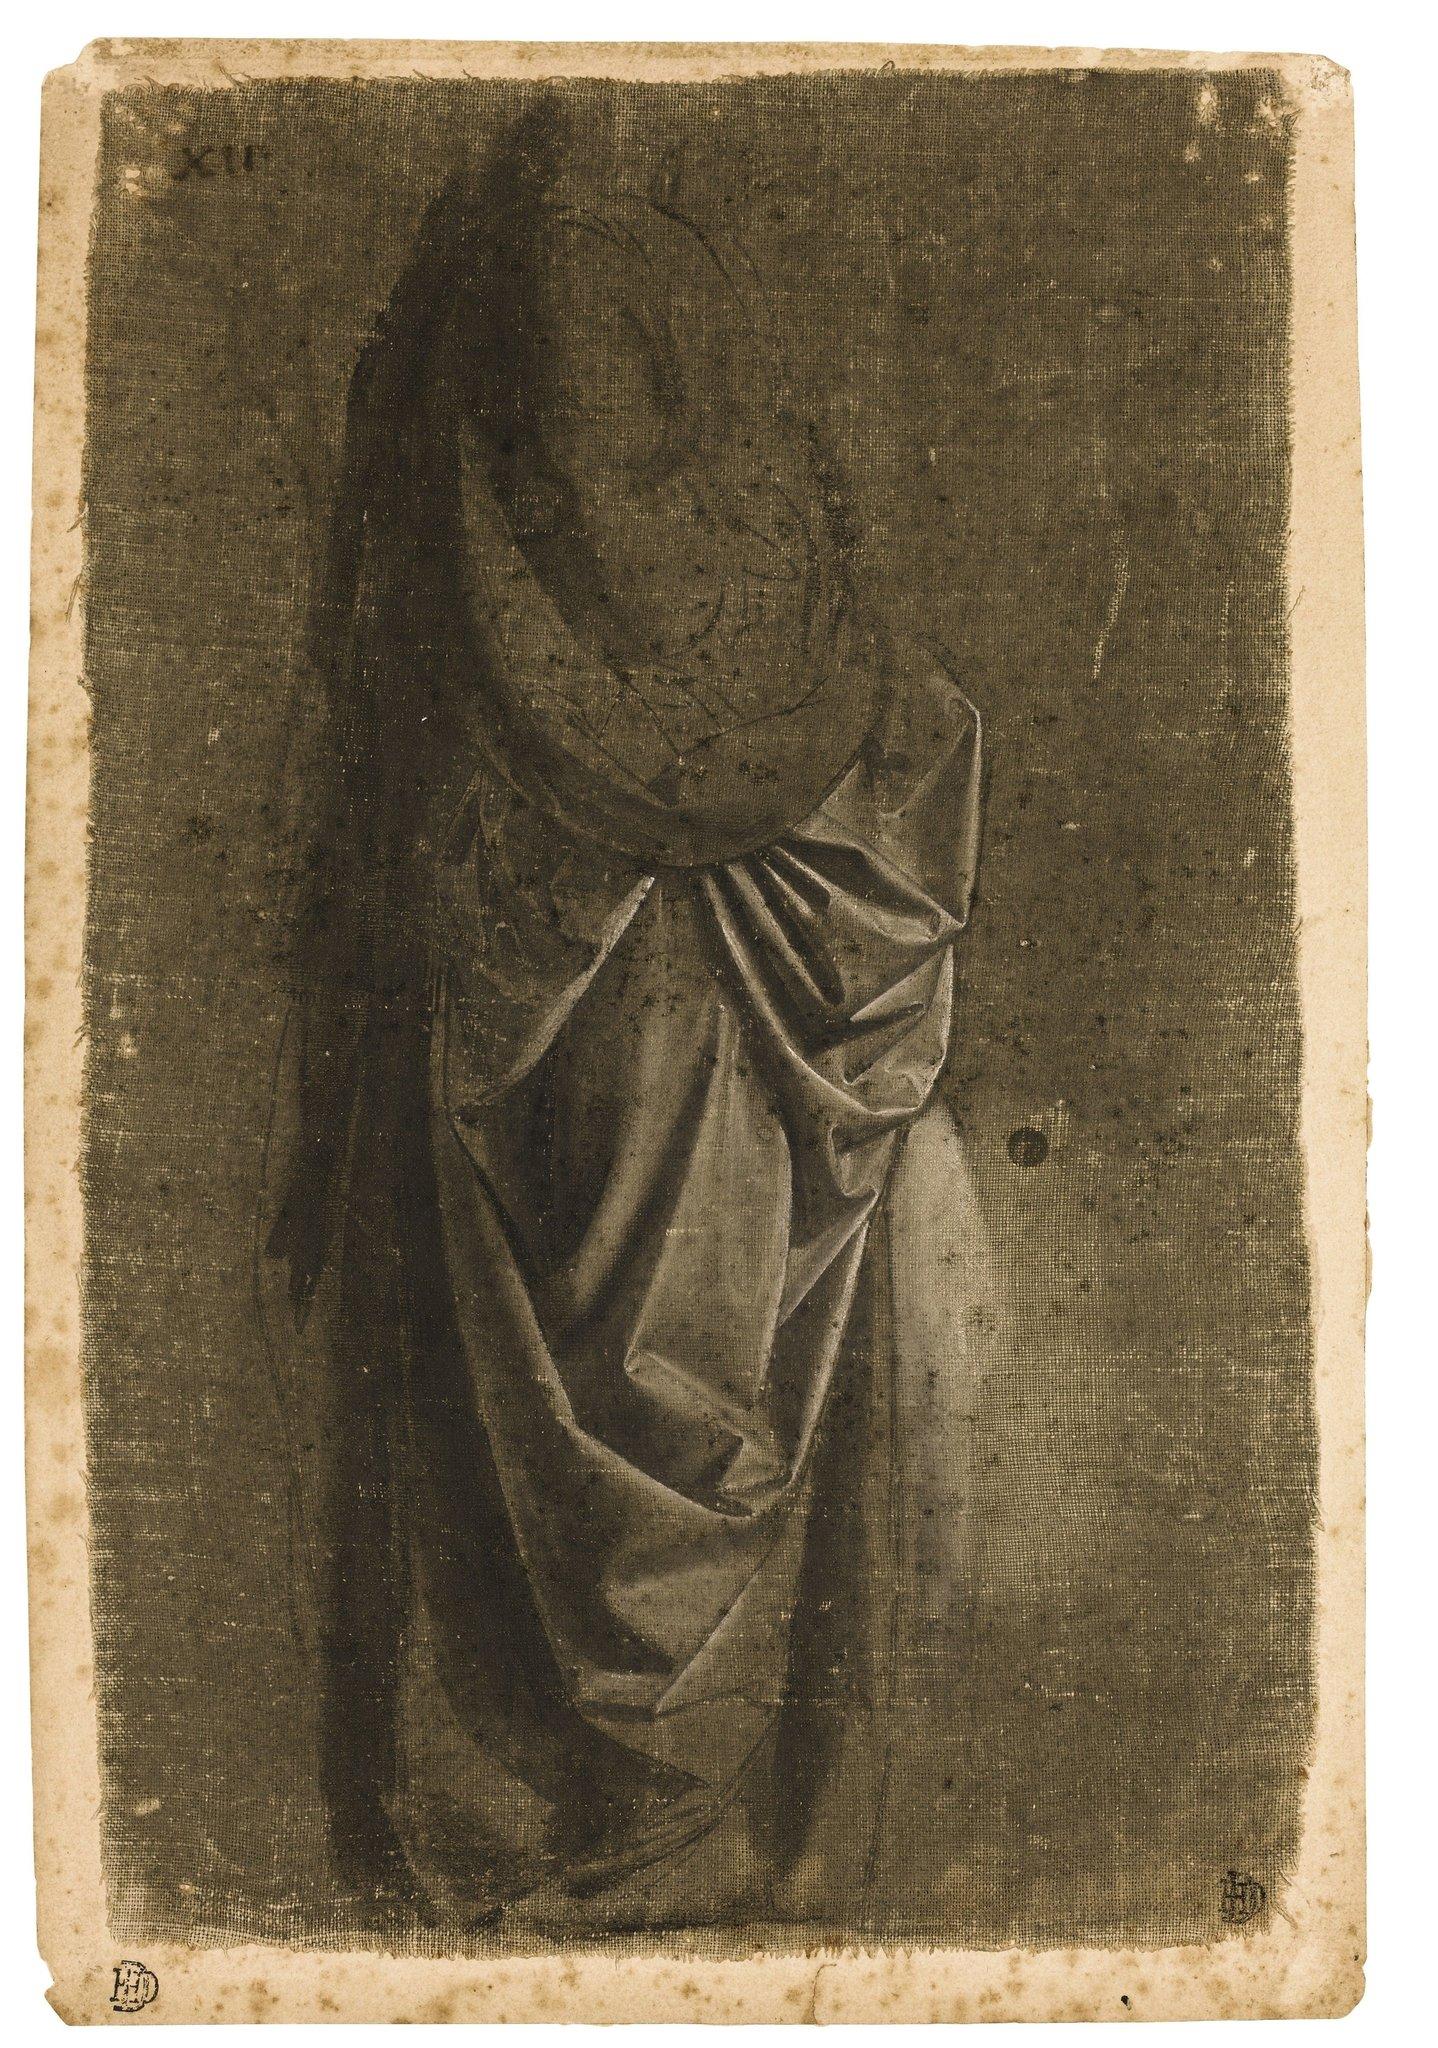 andrea-del-verrocchio-drapery-study-sold-at-sothebys-london-july-2014.jpg